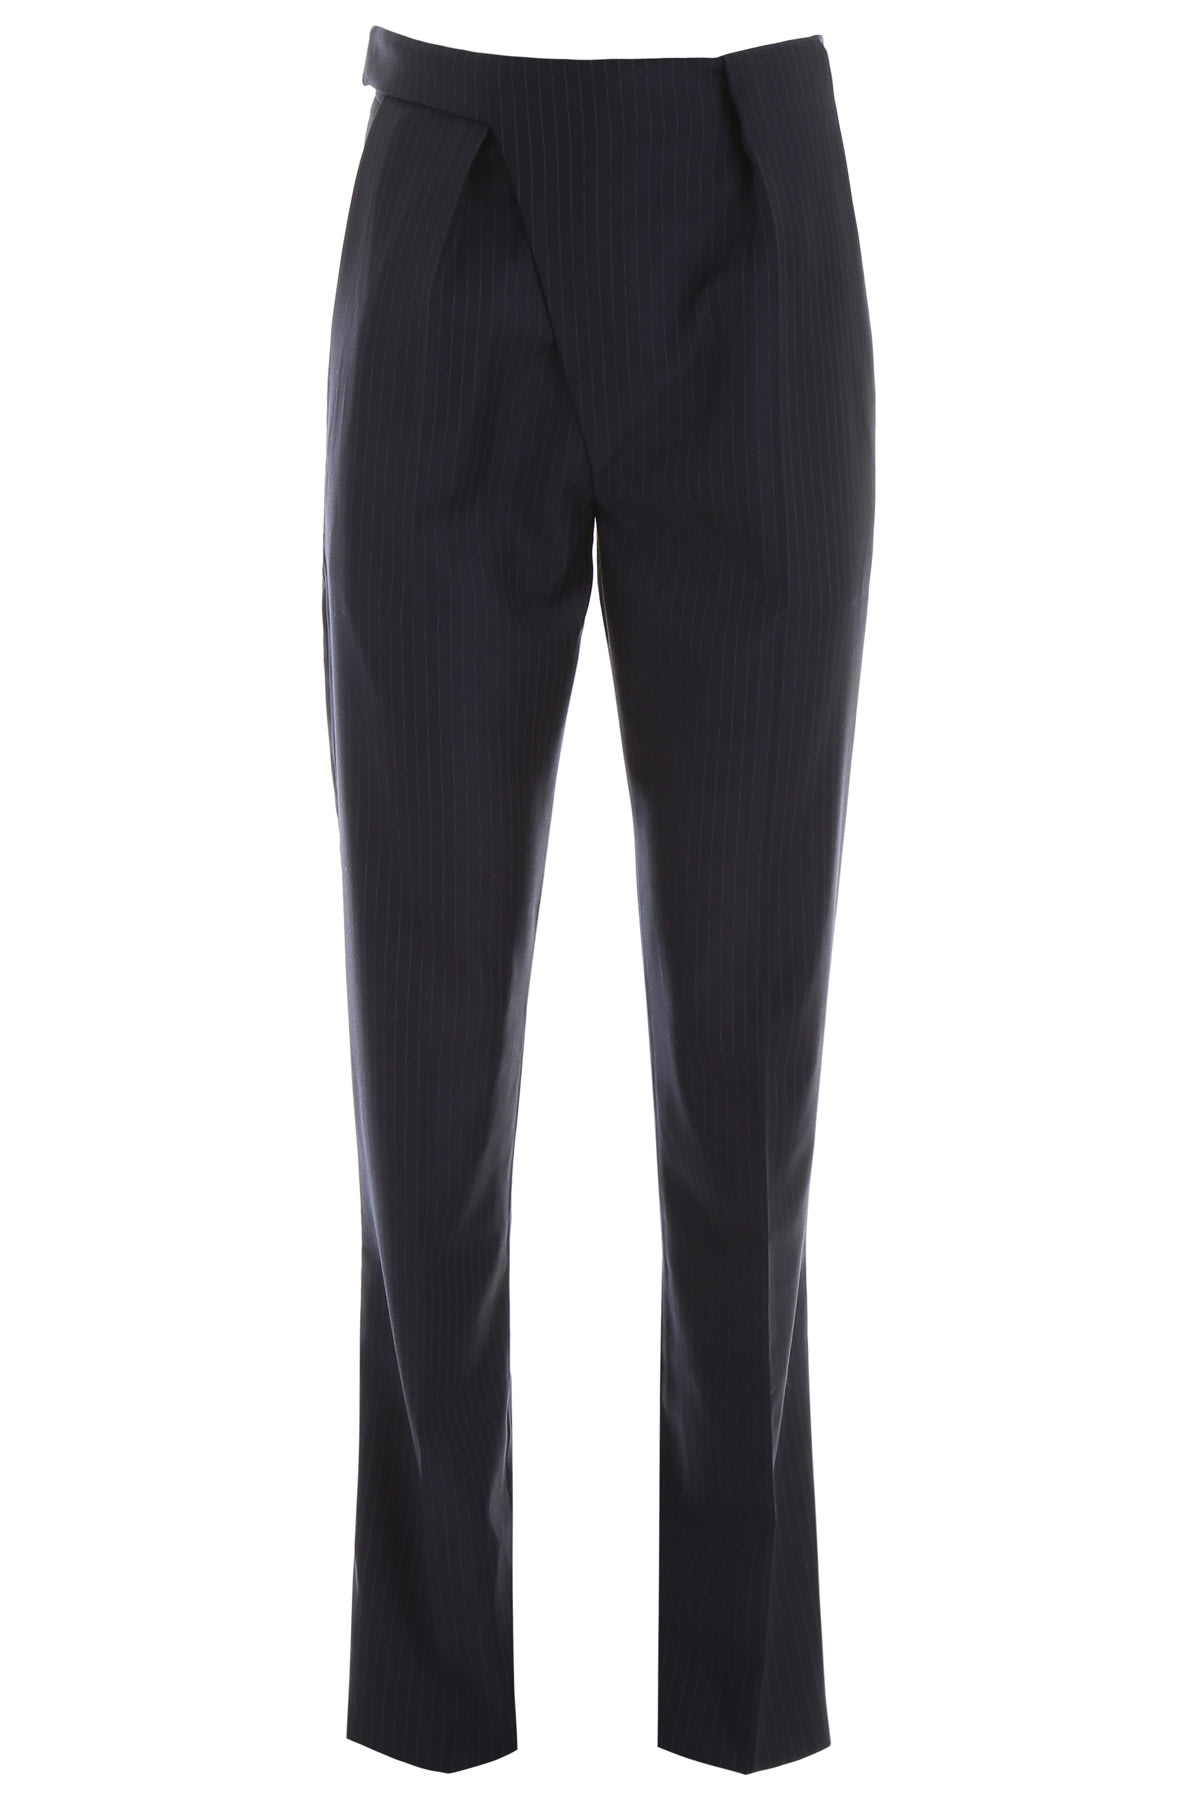 Coperni Pinstriped Trousers